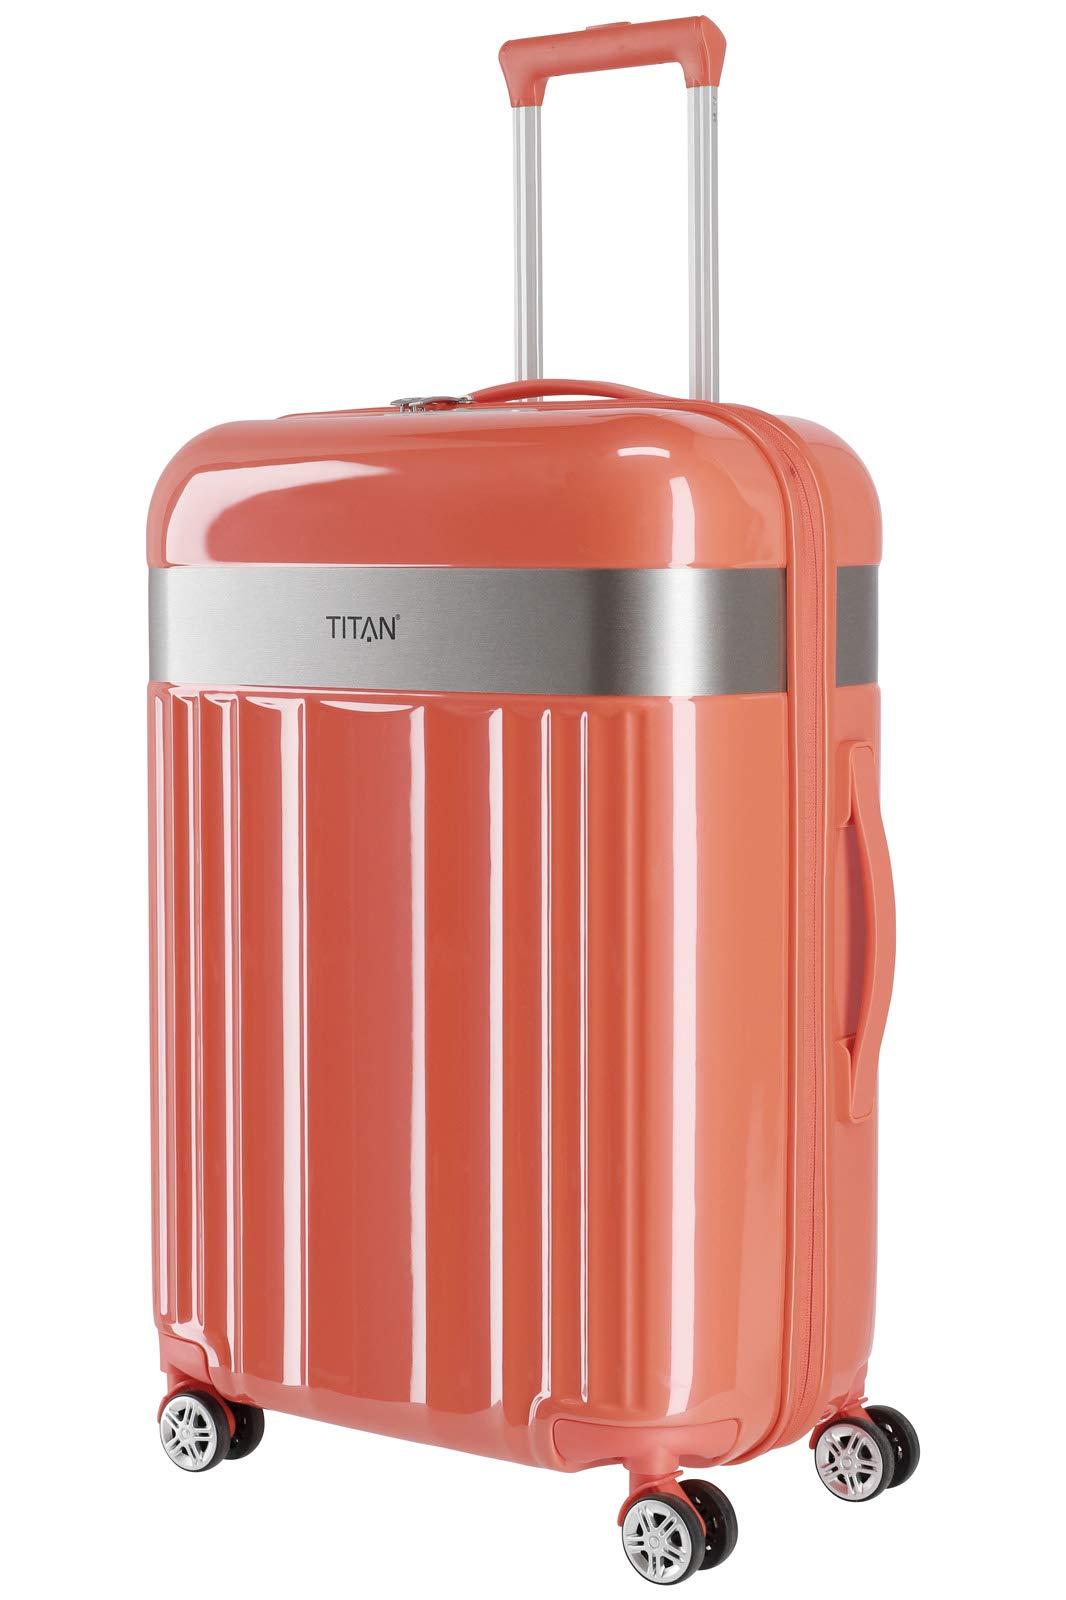 Titan-Gepckserie-Spotlight-Flash-Edle-Titan-trolleys-und-Beautycases-in-Knallbunten-Trendfarben-Koffer-M-67-cm-67-cm